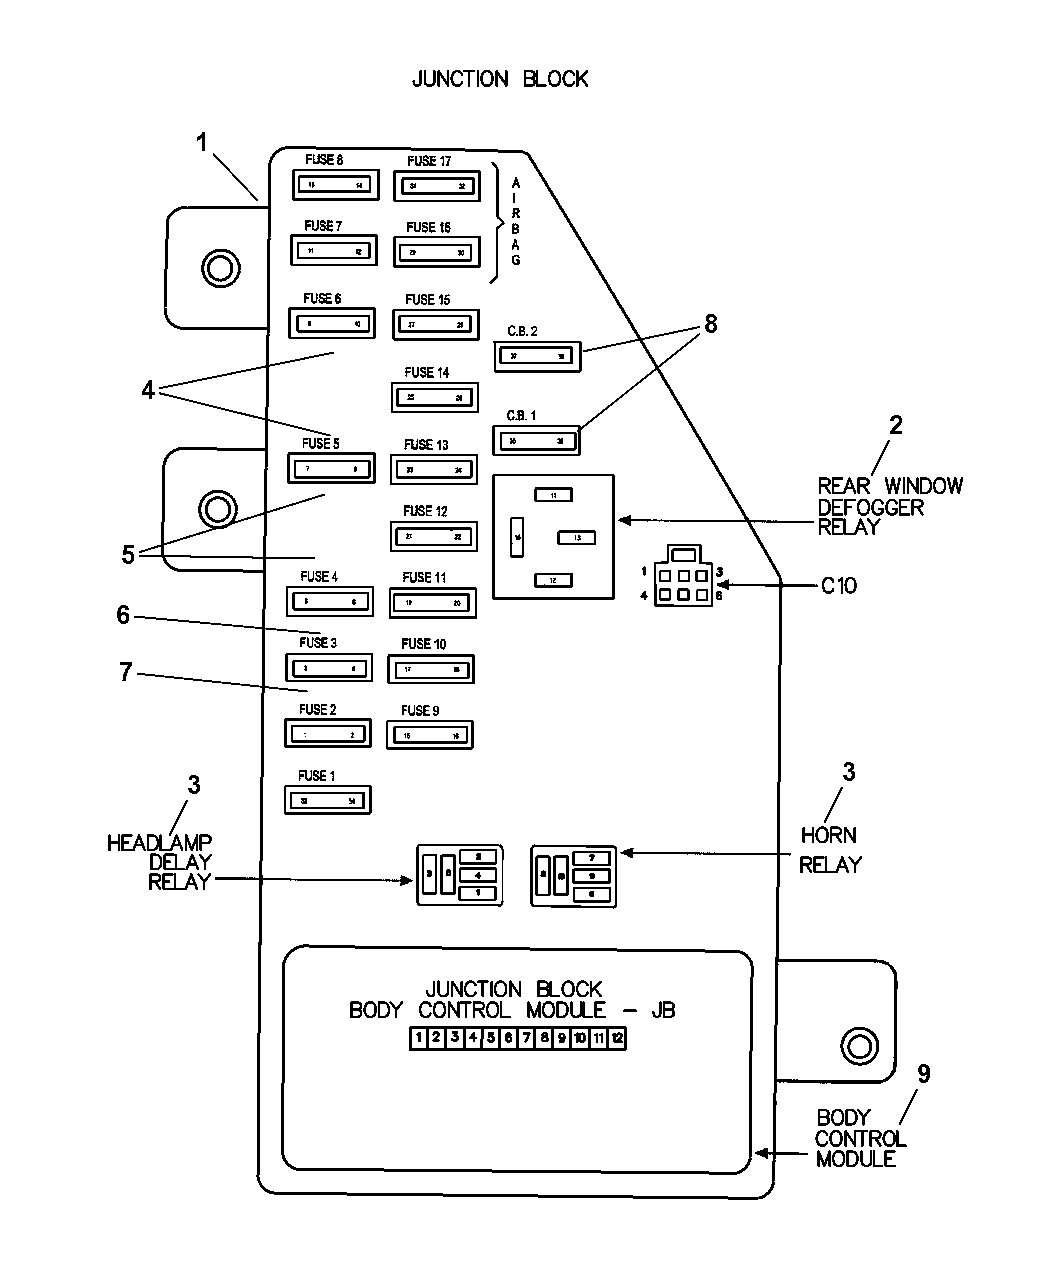 2001 dodge stratus sedan junction block relays, fuses and 2001 Dodge Stratus Fuse Diagram